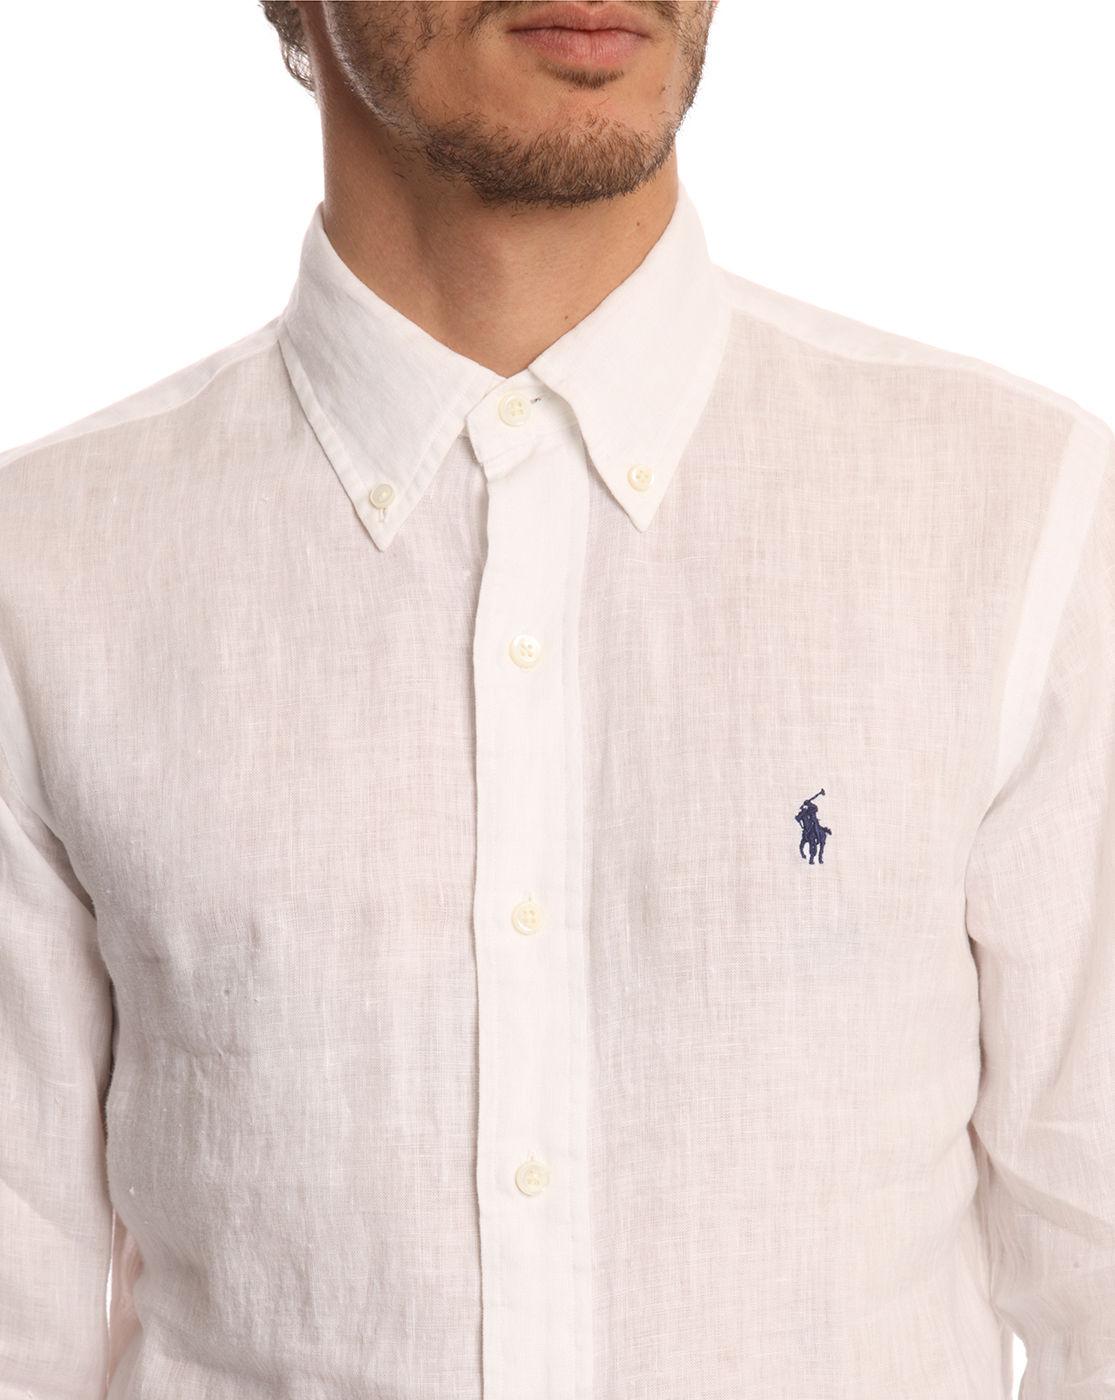 White Linen Shirt Mens Slim Fit | Is Shirt